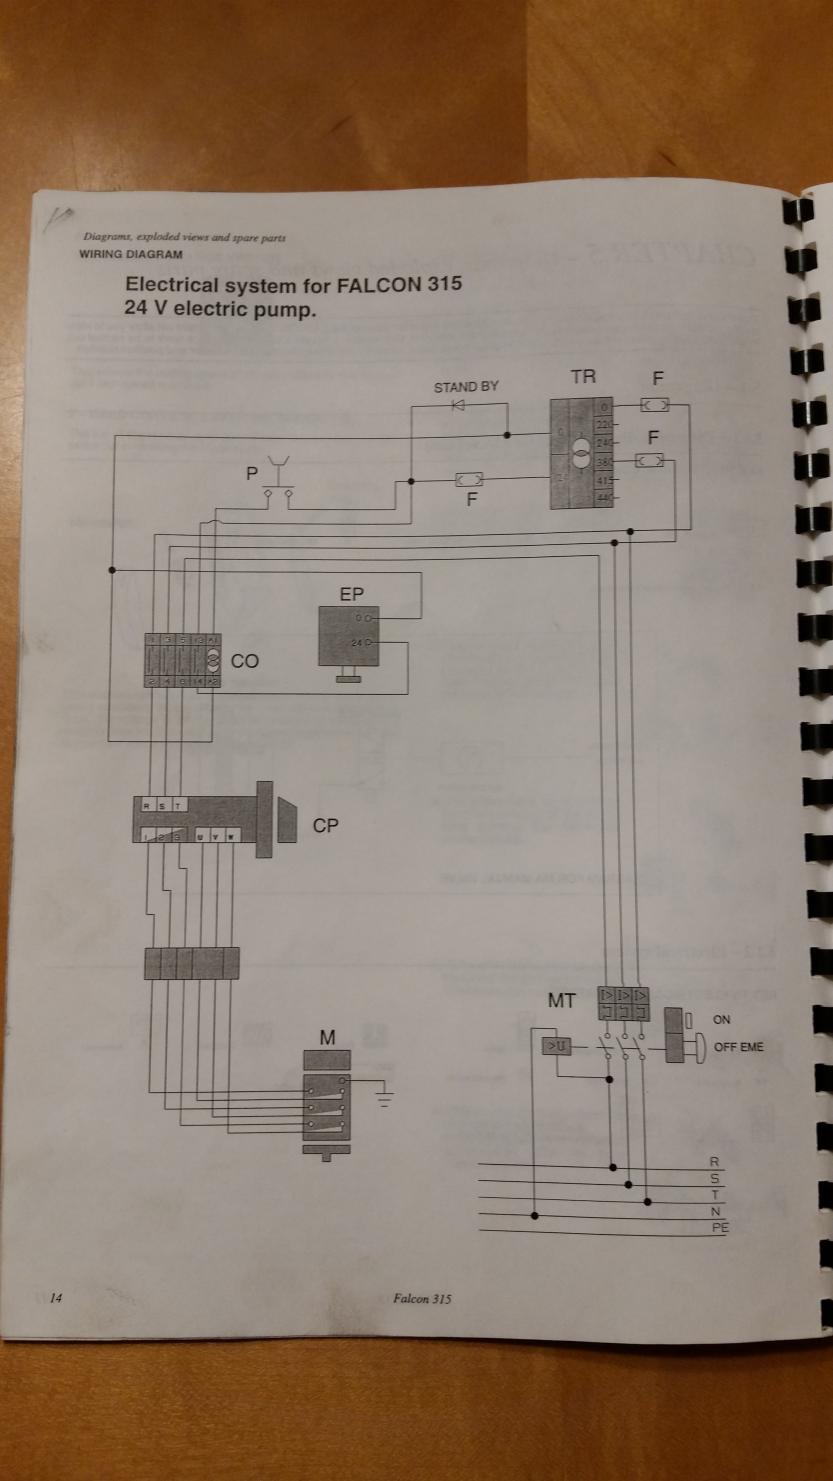 garage door switch wiring diagram connecting vfd to 2 speed cold saw  connecting vfd to 2 speed cold saw